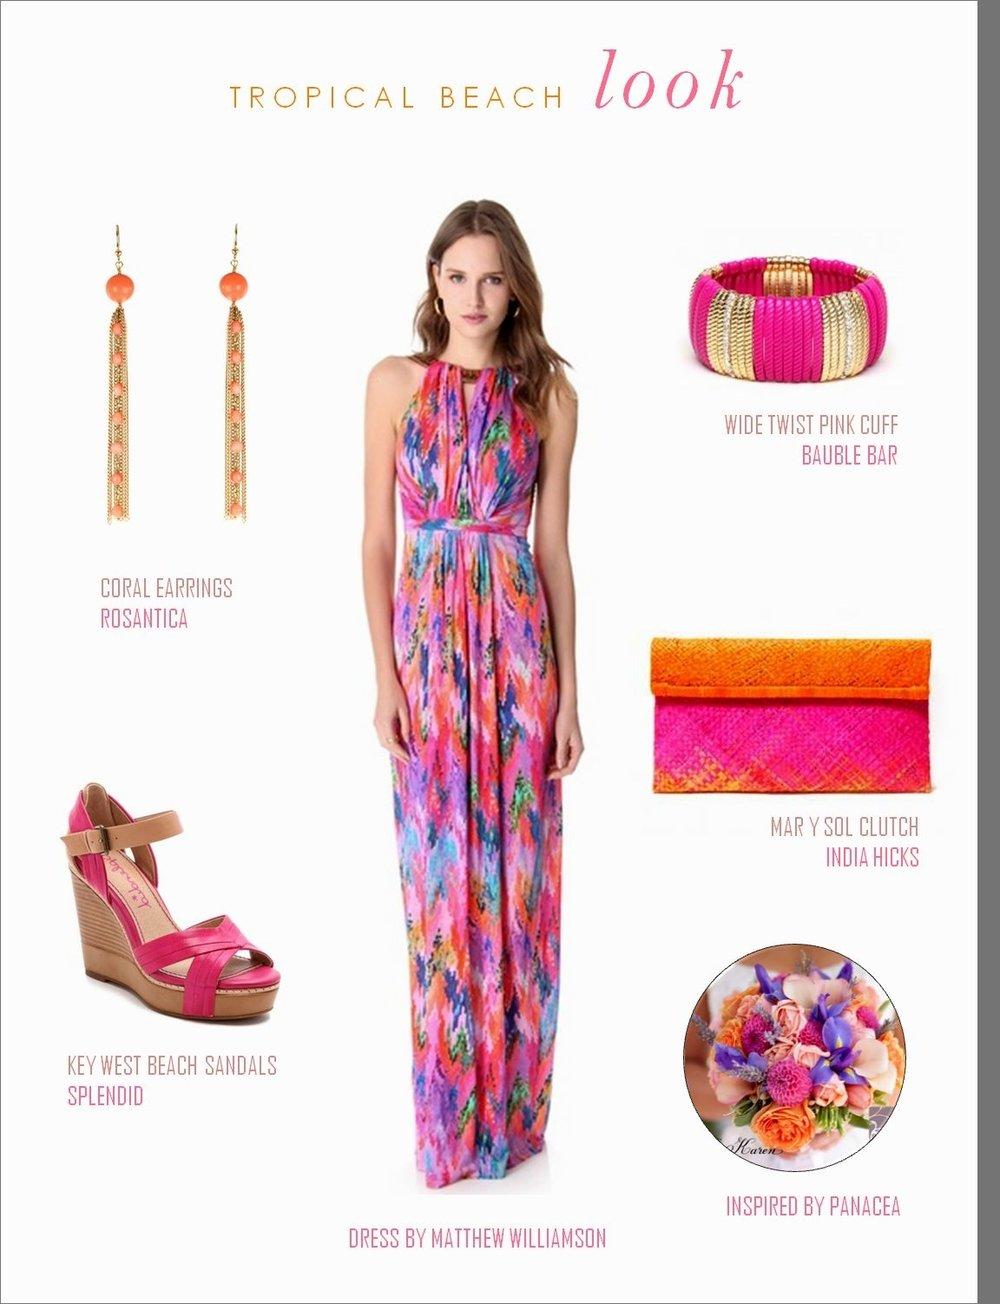 what-to-wear-for-a-summer-wedding-guest-outfit-pink-magenta-dress-maxi-print-pink-shoe-sandalw-earrings-beach-pink-bag-clutch-bracelet-dinner.jpg